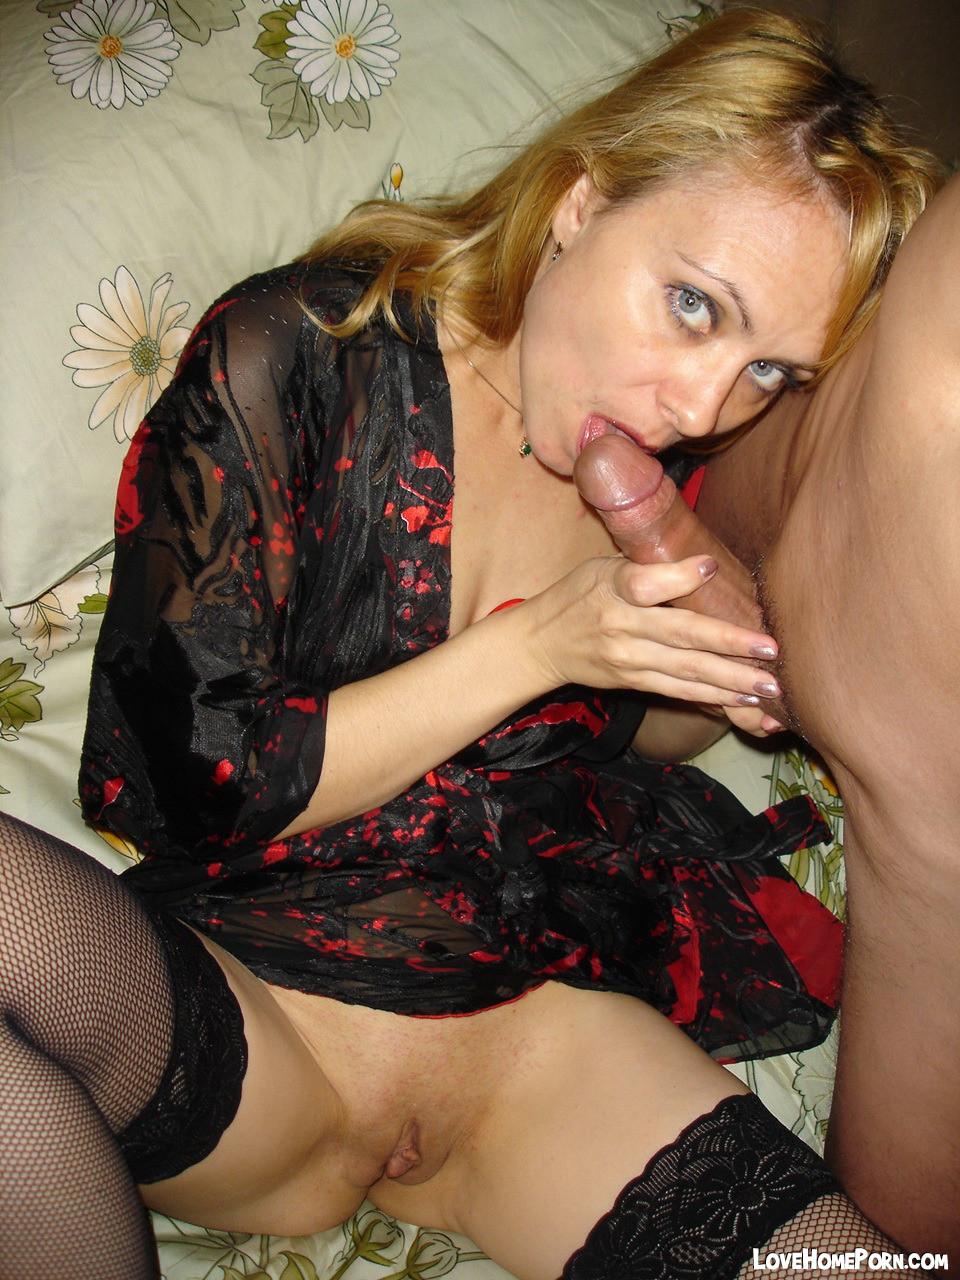 фото интим дама зрелая замужняя сексуальная